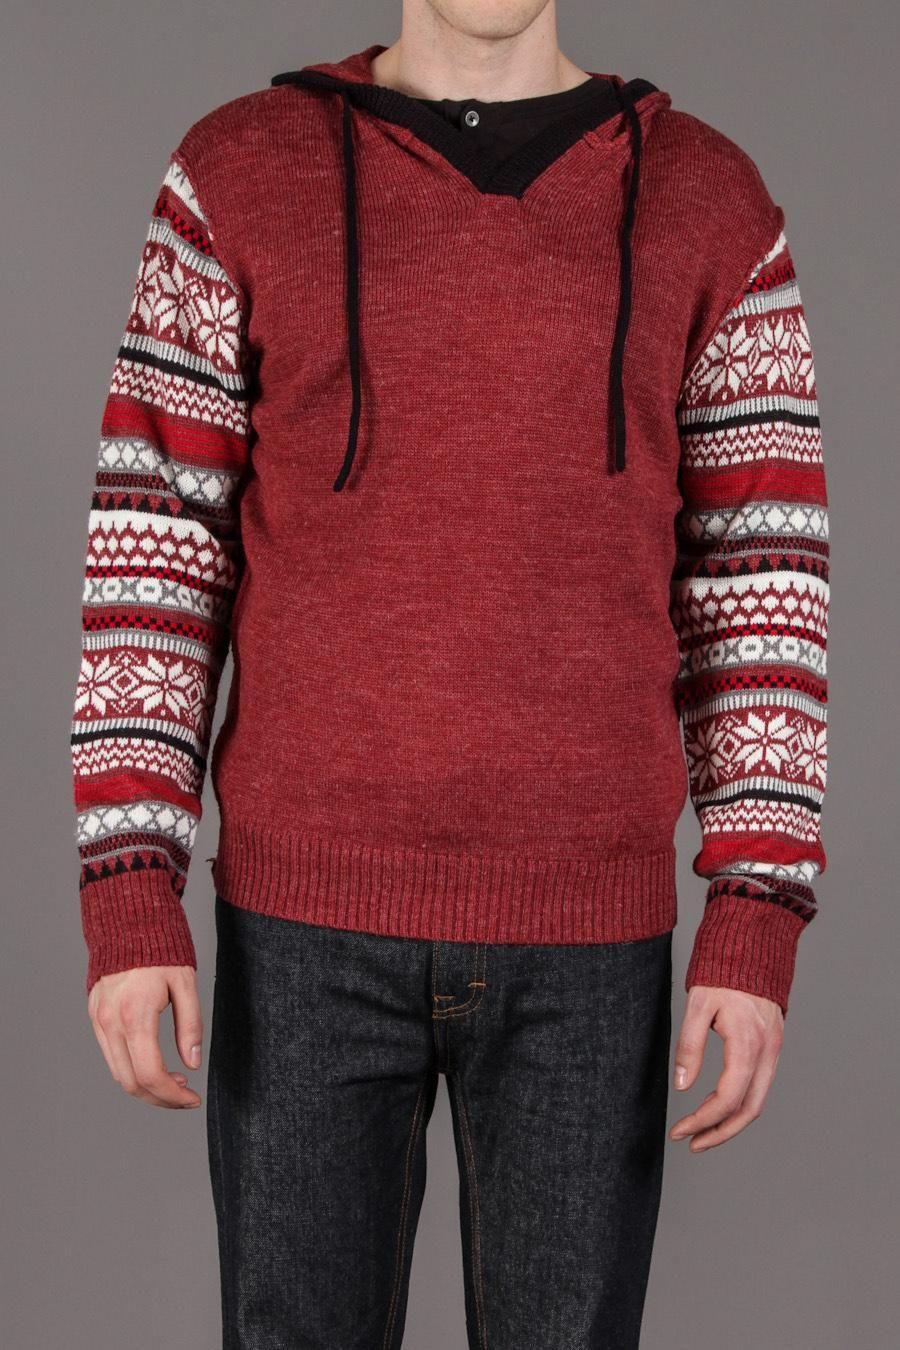 Projek Raw Pullover Hooded Knit Sweater w/ Fairisle Sleeves ...